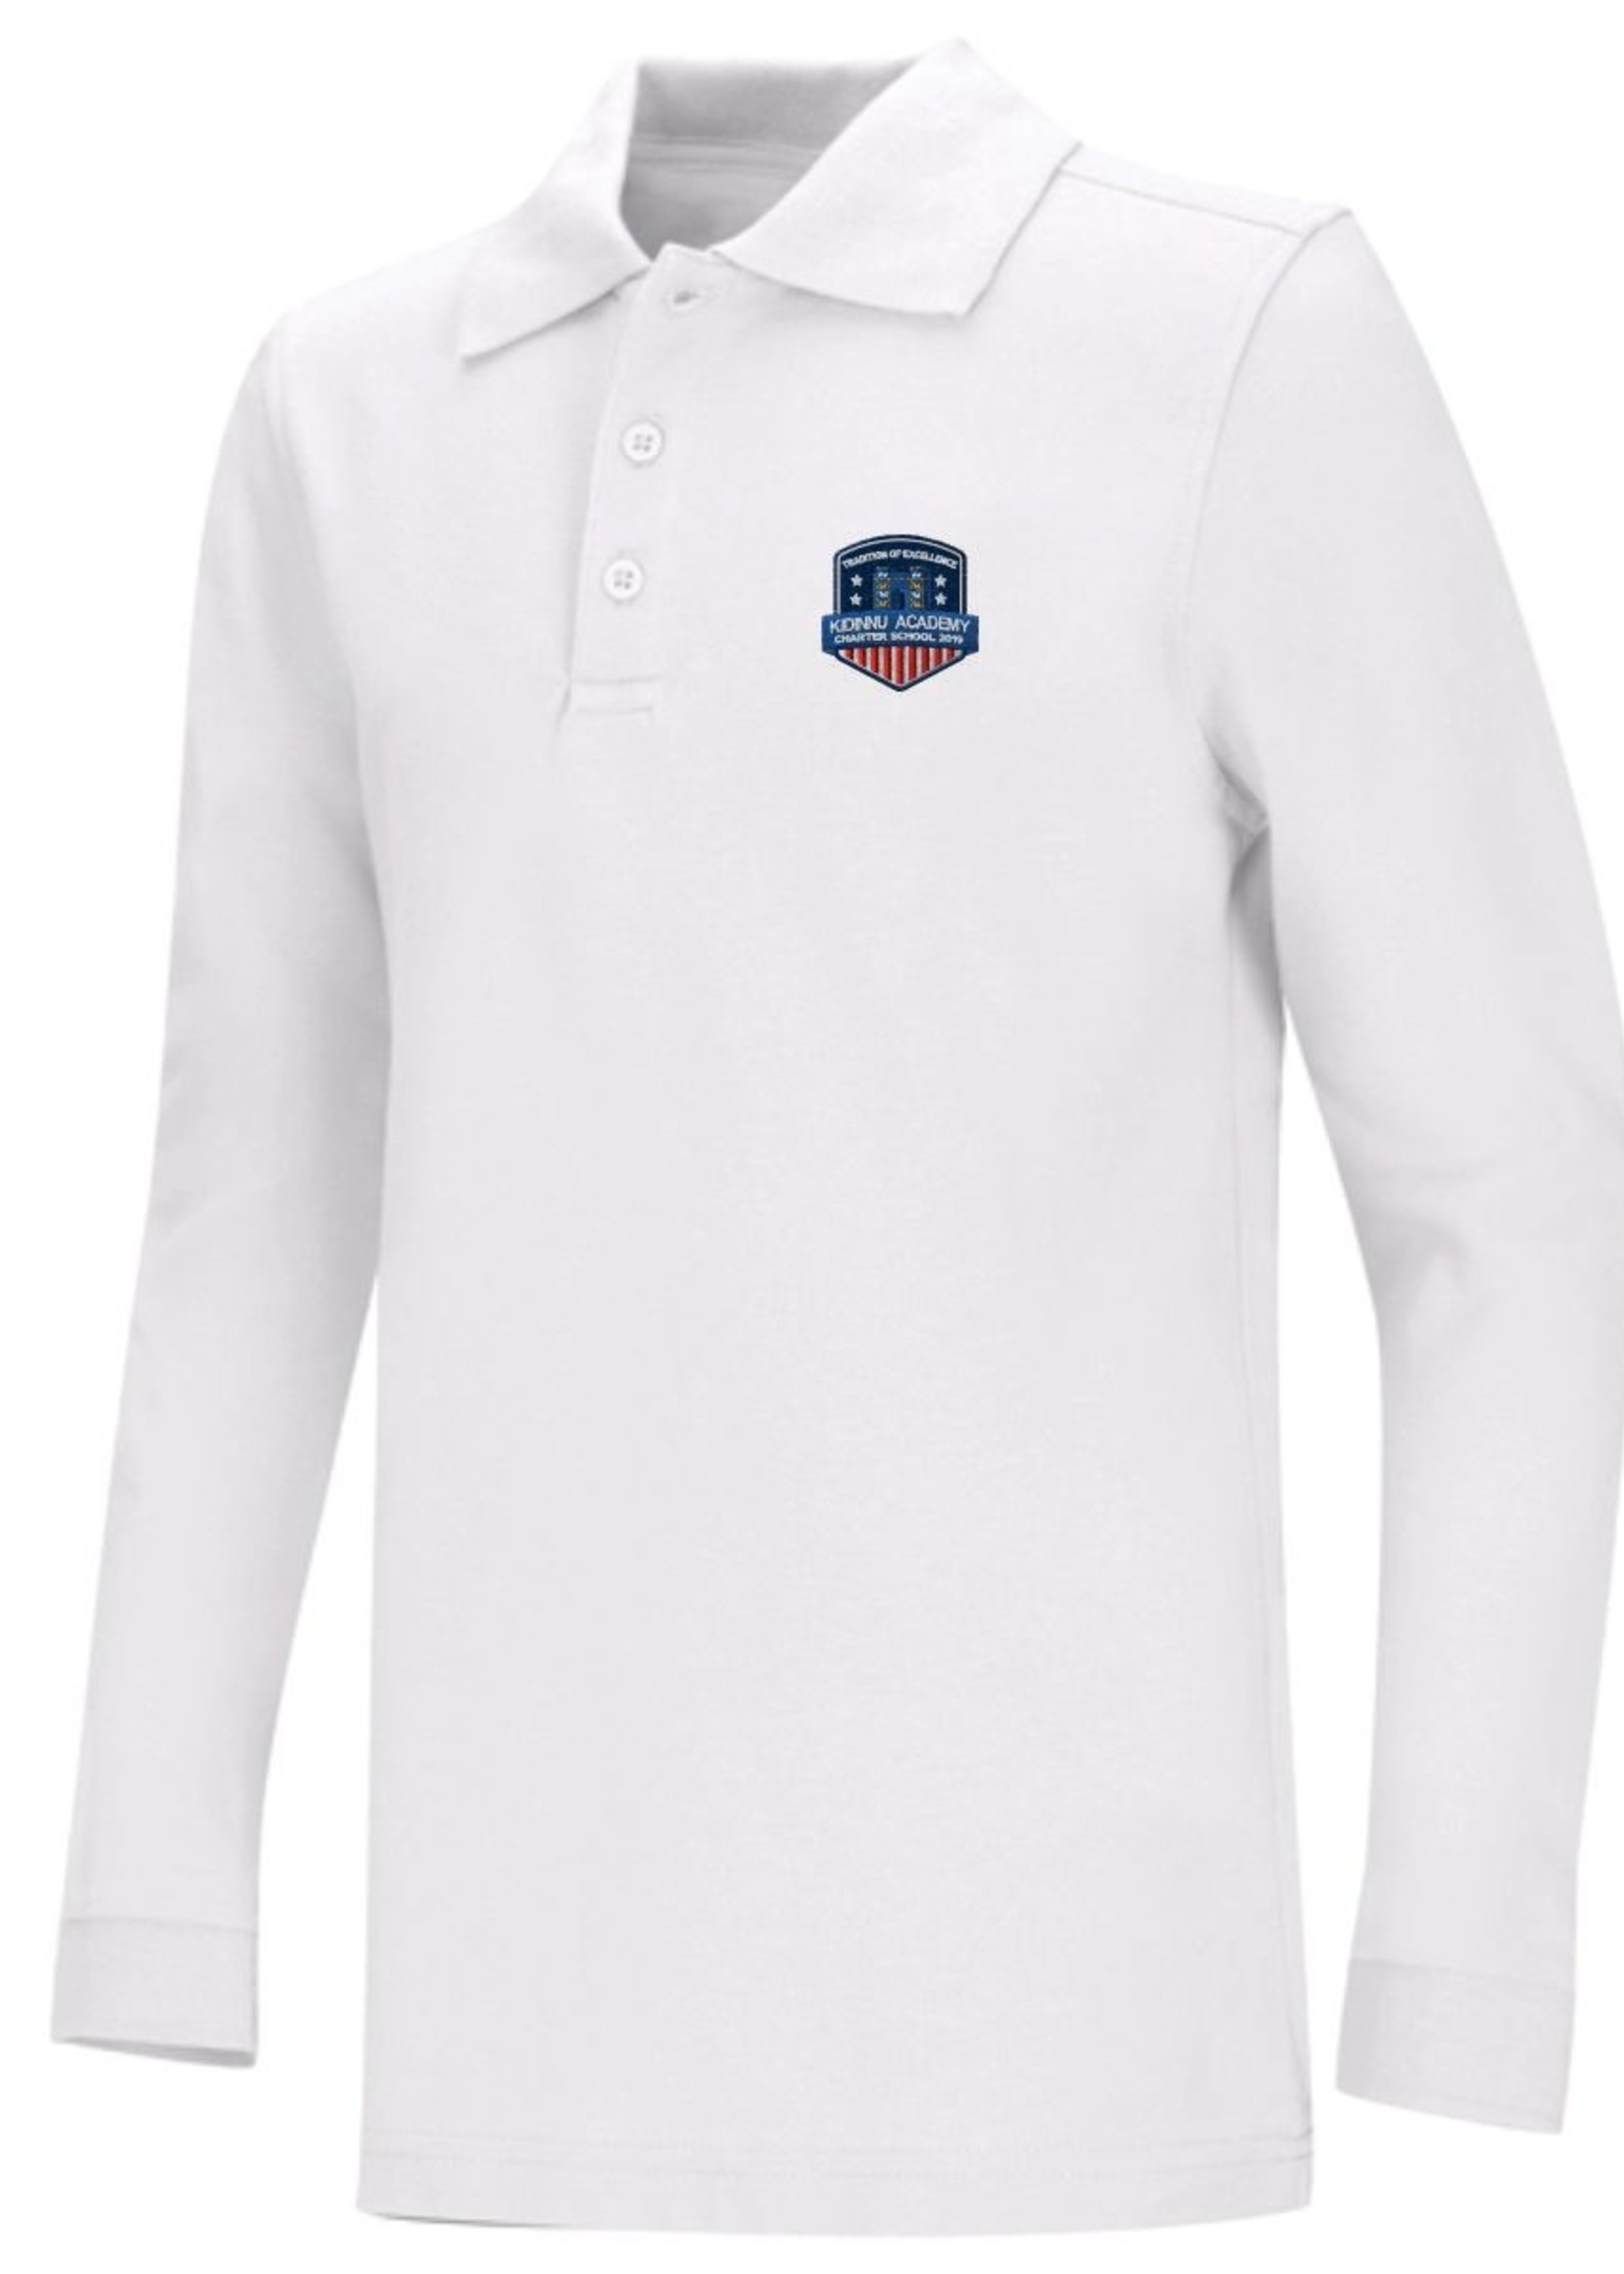 TUS KACS Value Long Sleeve Pique Polo